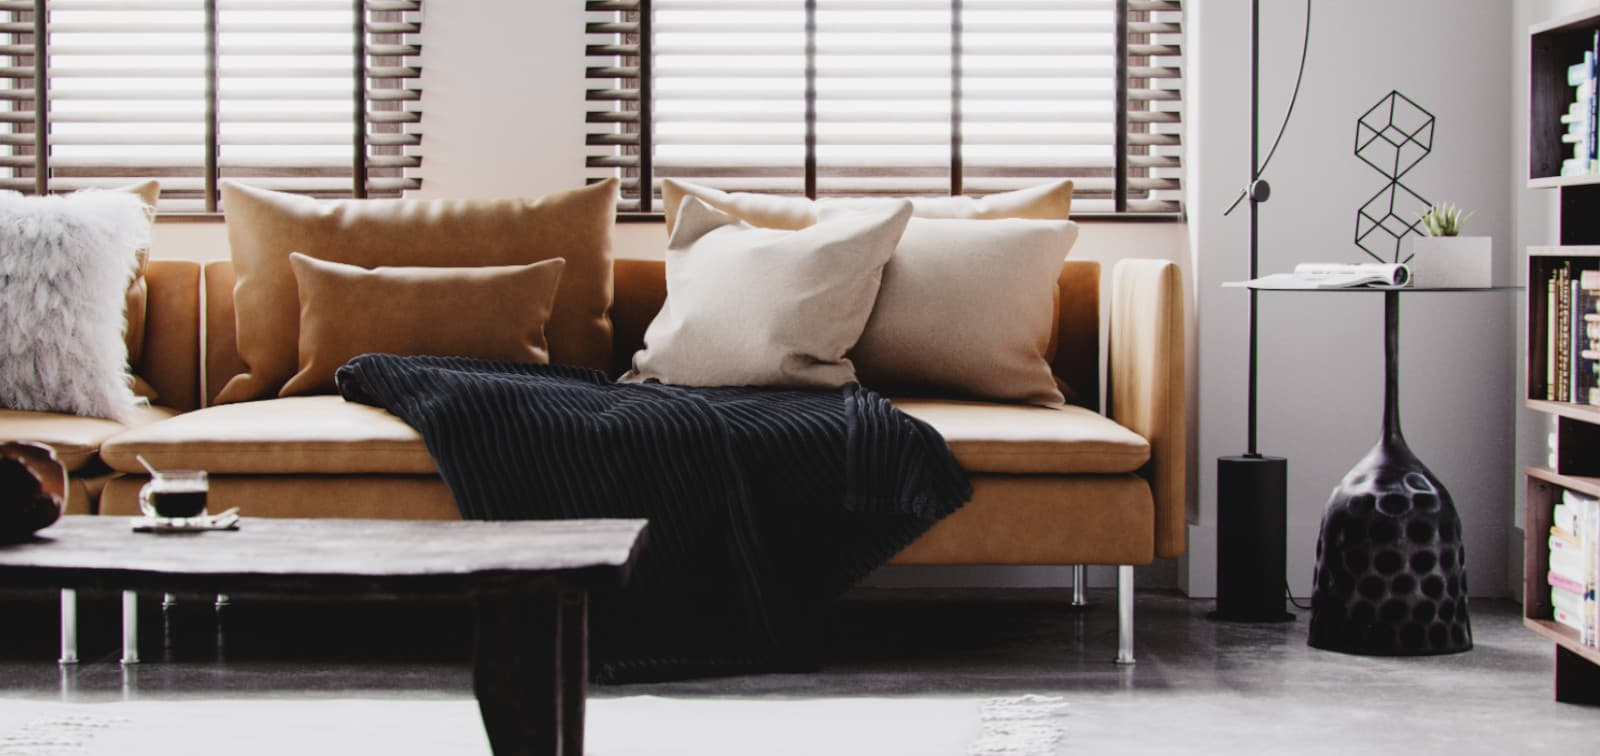 Musterring Ersatz Sofabezug Leder Braun